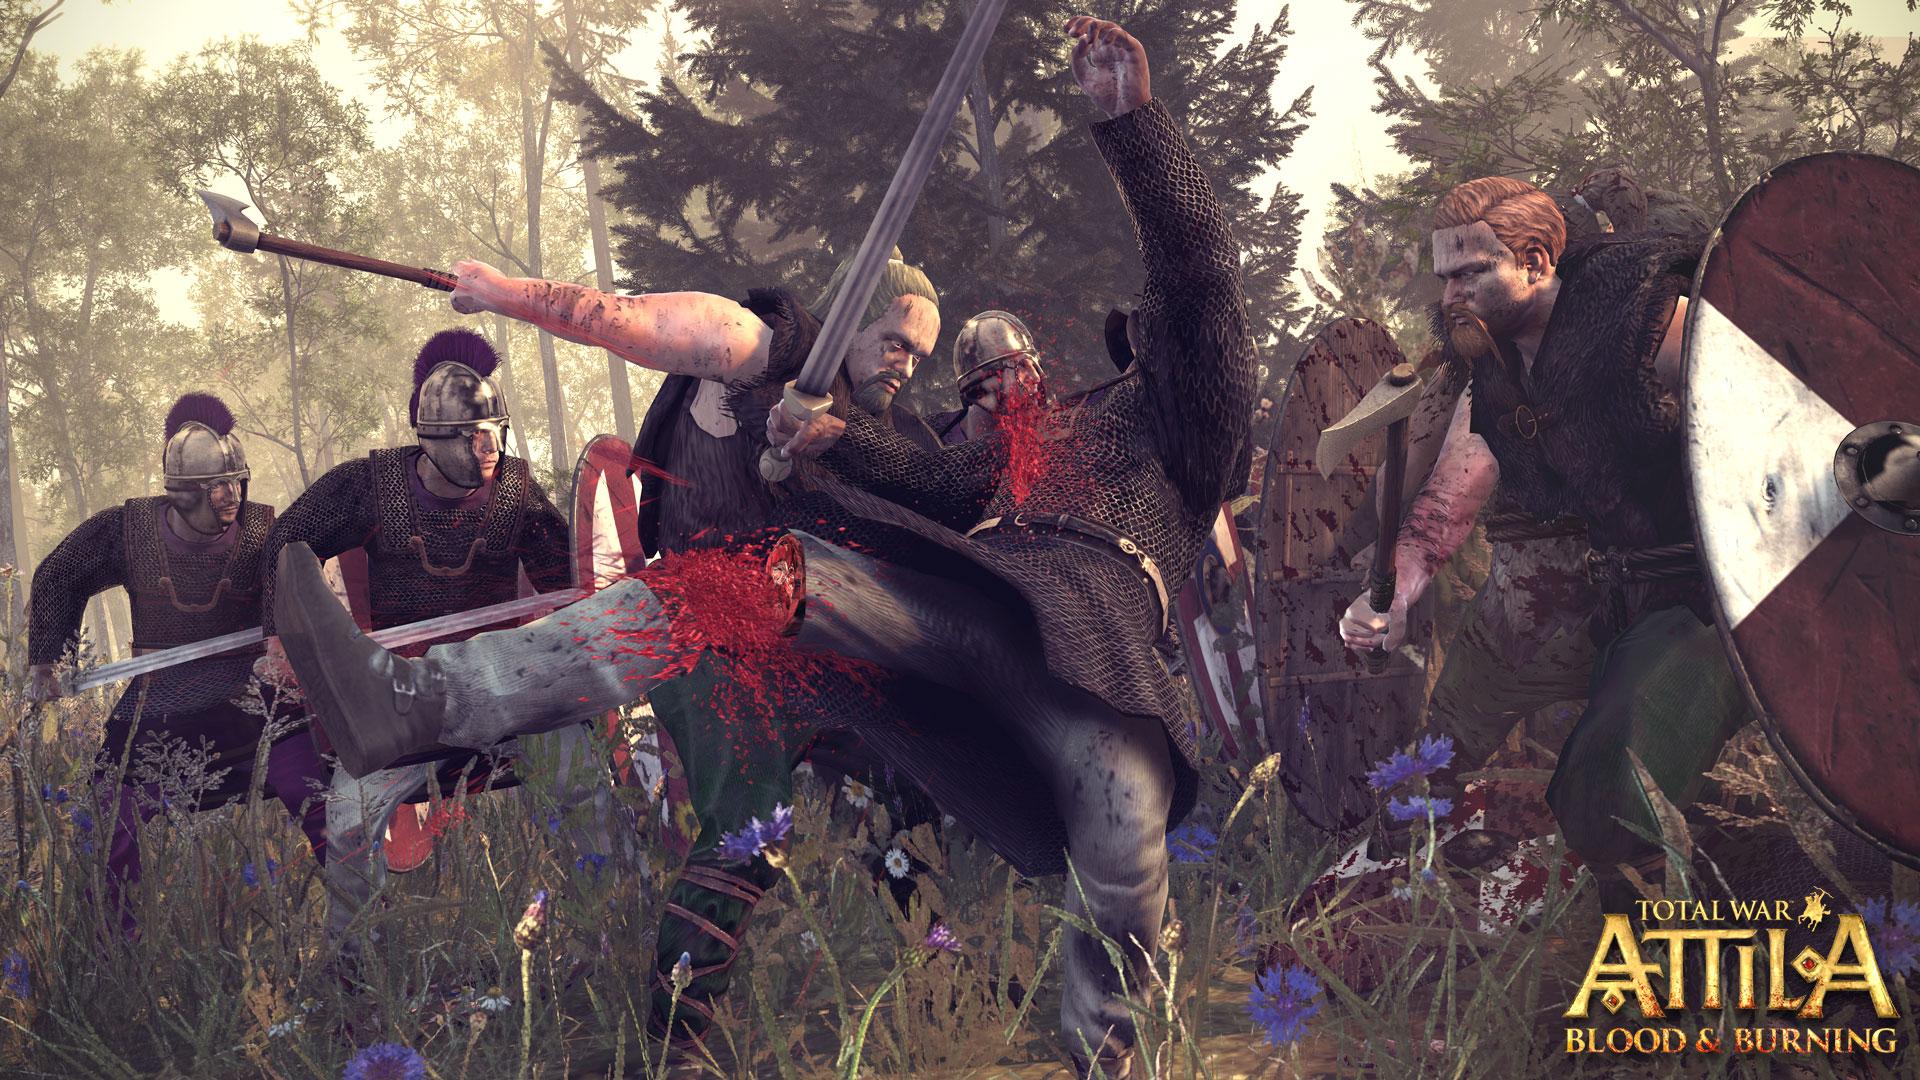 Total War Attila recibe dos nuevos DLC